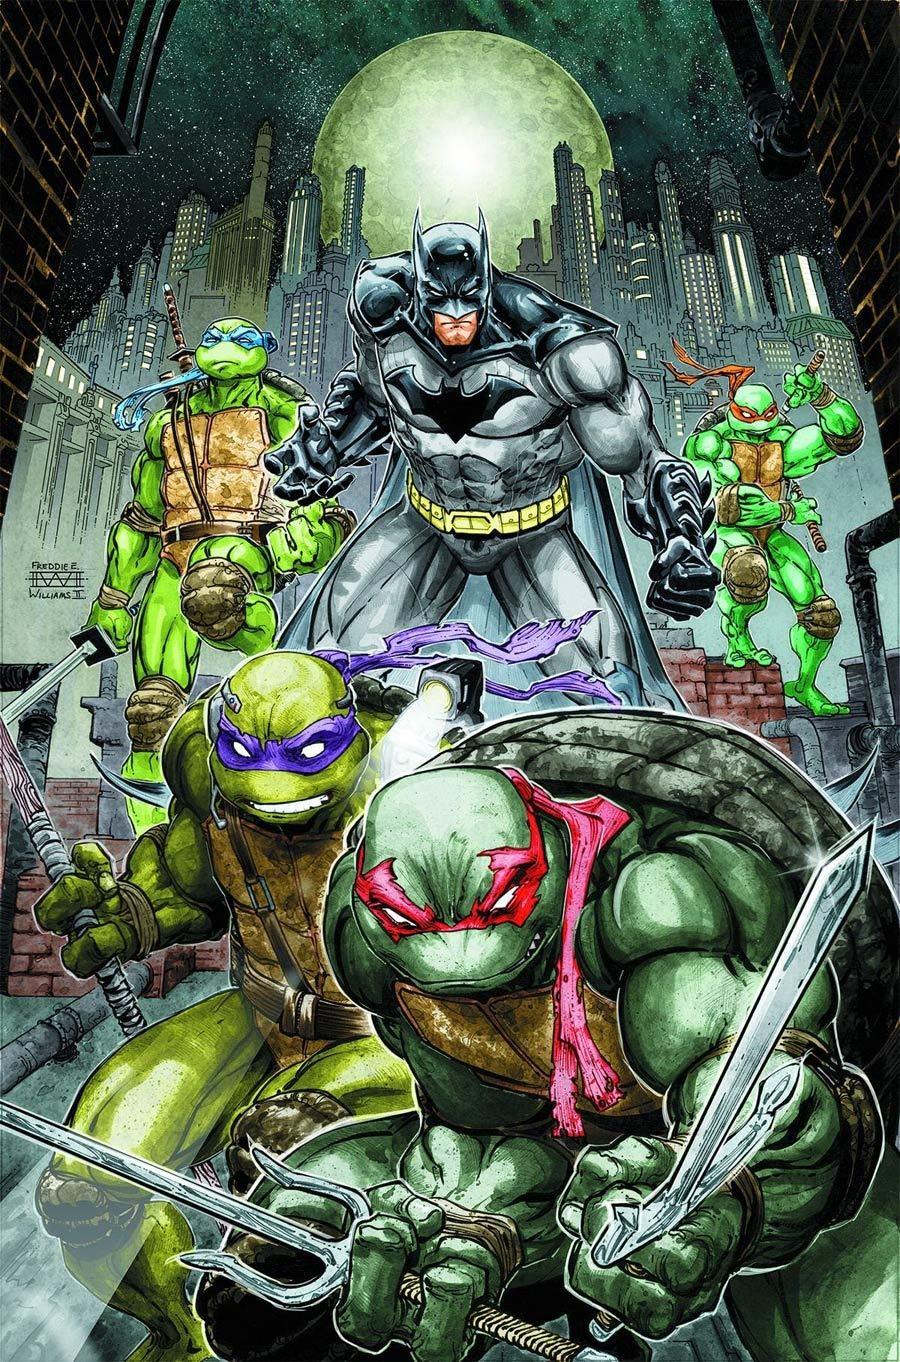 Batman Ninja Turtles